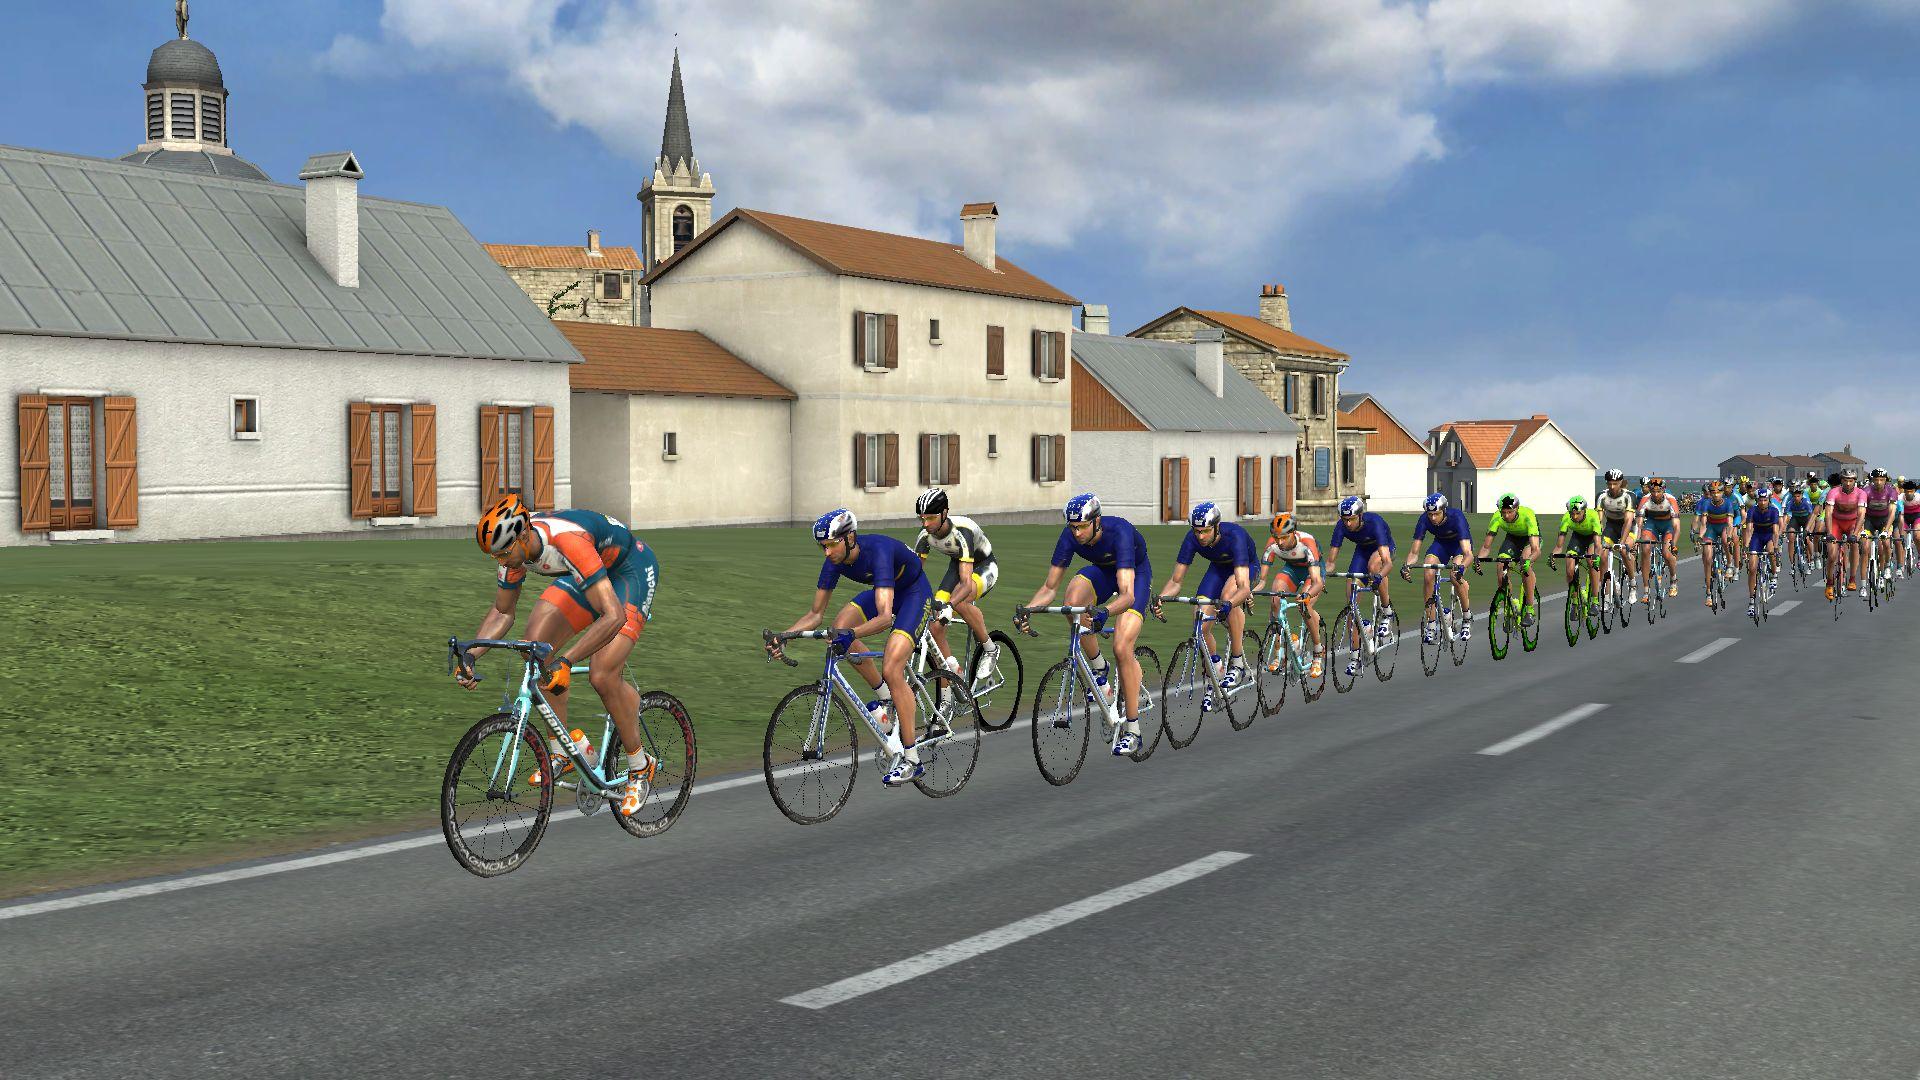 pcmdaily.com/images/mg/2019/Races/GTM/Giro/mg19_giro_12_PCM0063.jpg